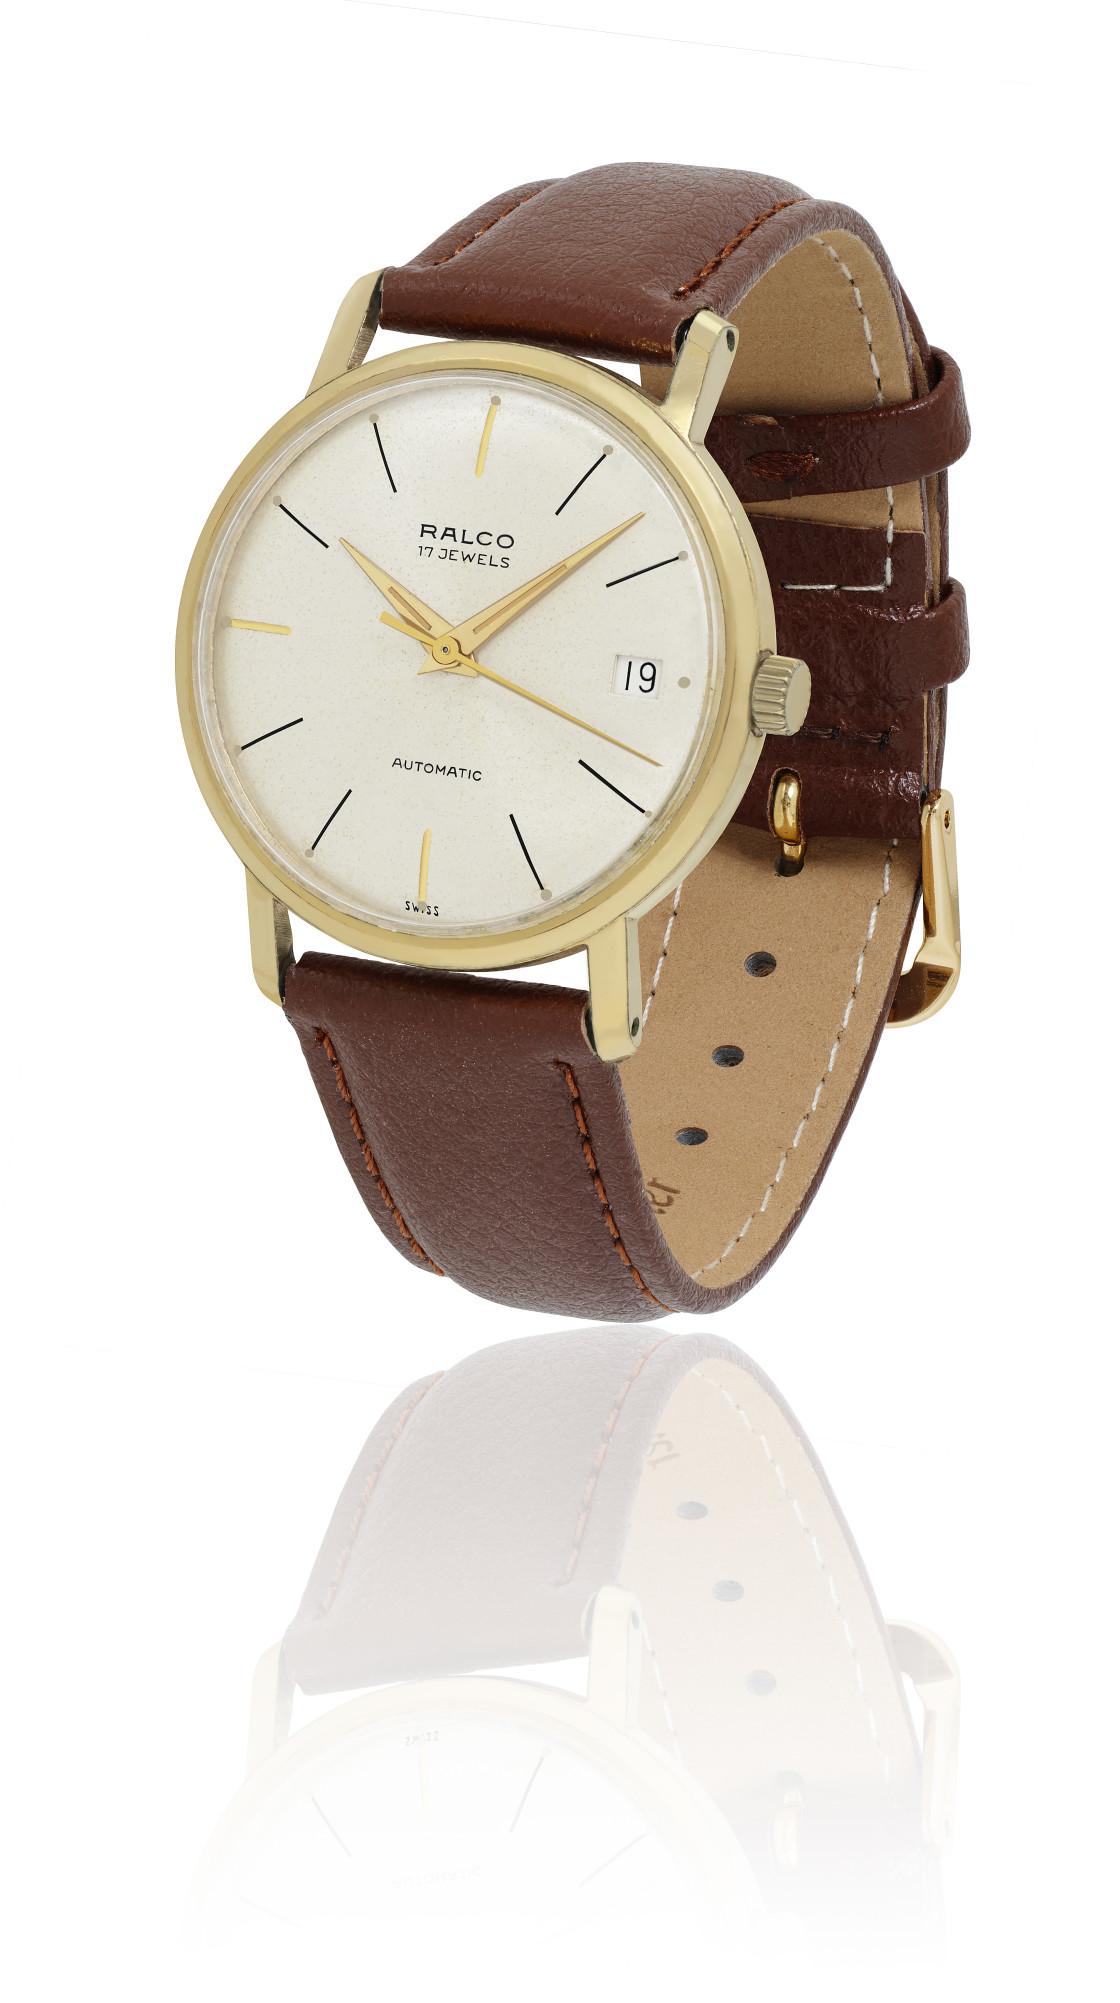 """1950s Ralco automatic Swiss watch"" stock image"